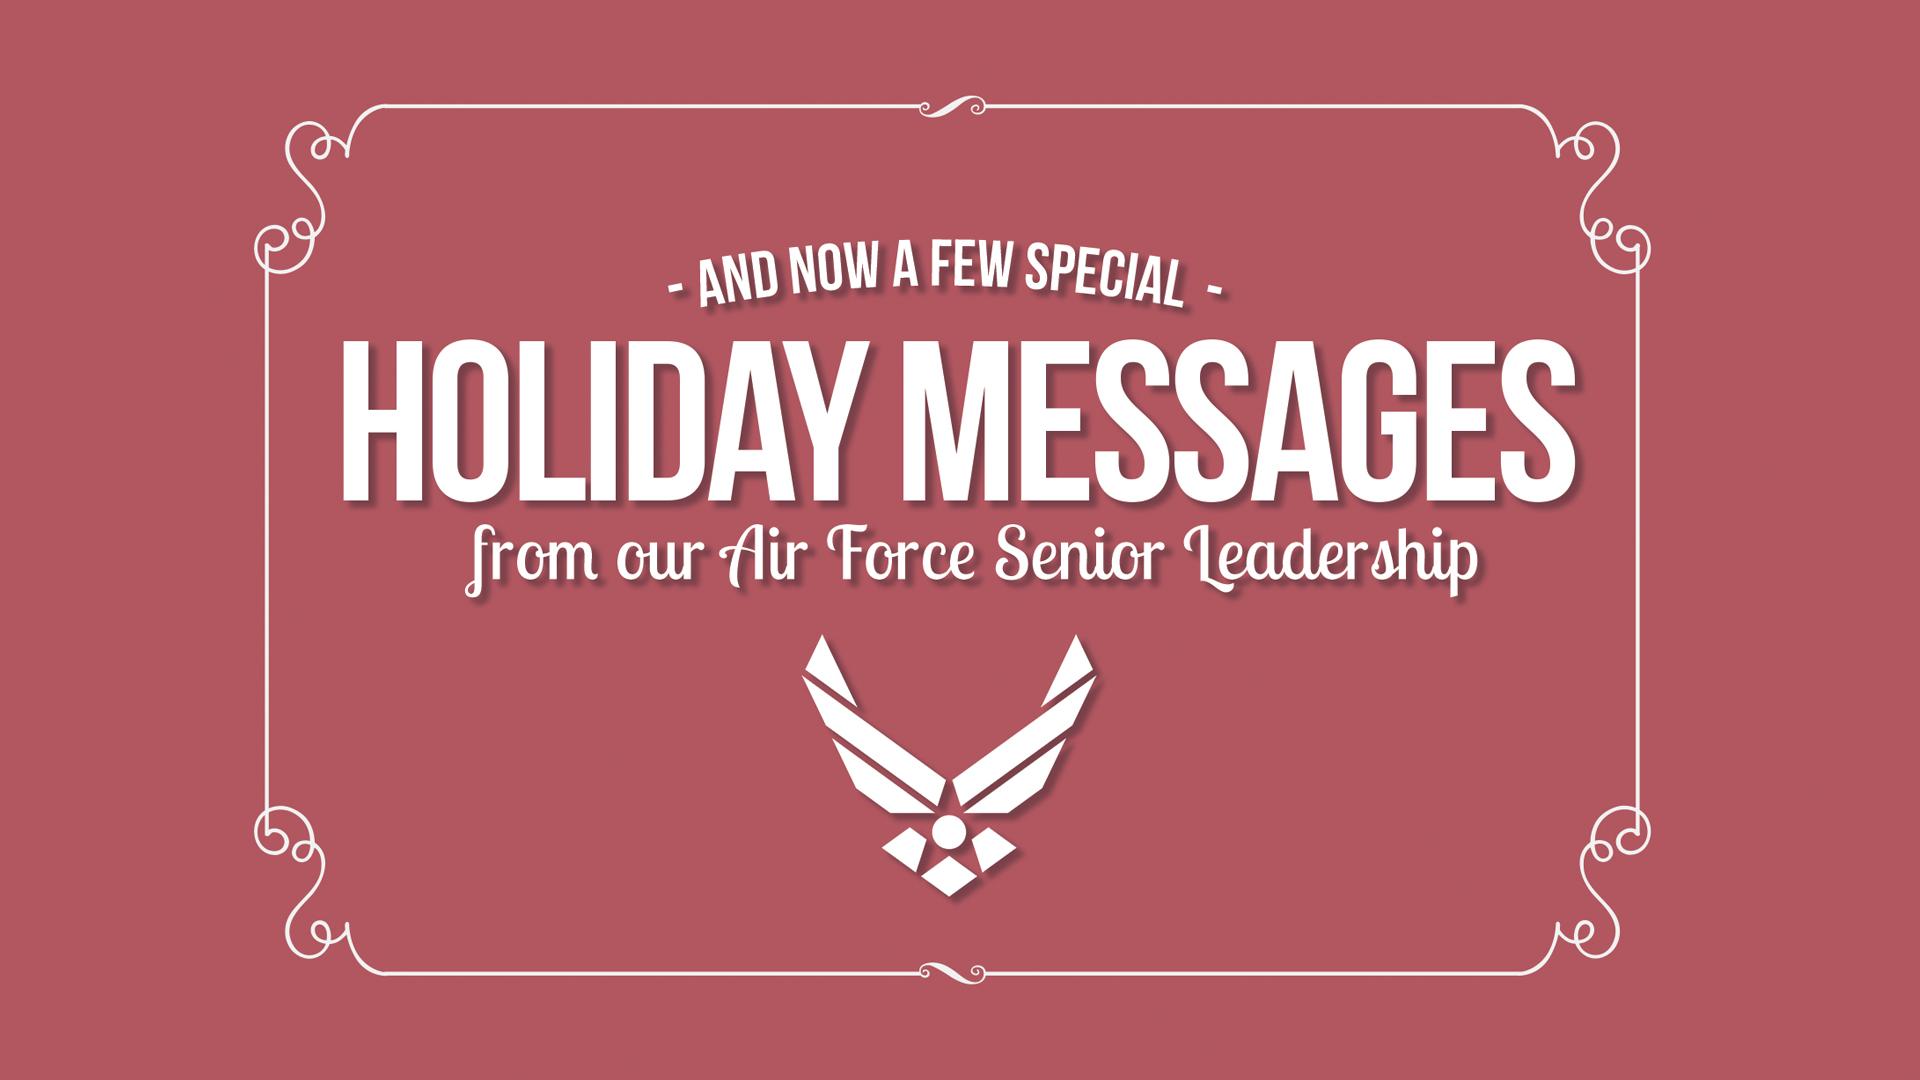 Af senior leaders share holiday messages us air force af senior leaders share holiday messages kristyandbryce Gallery